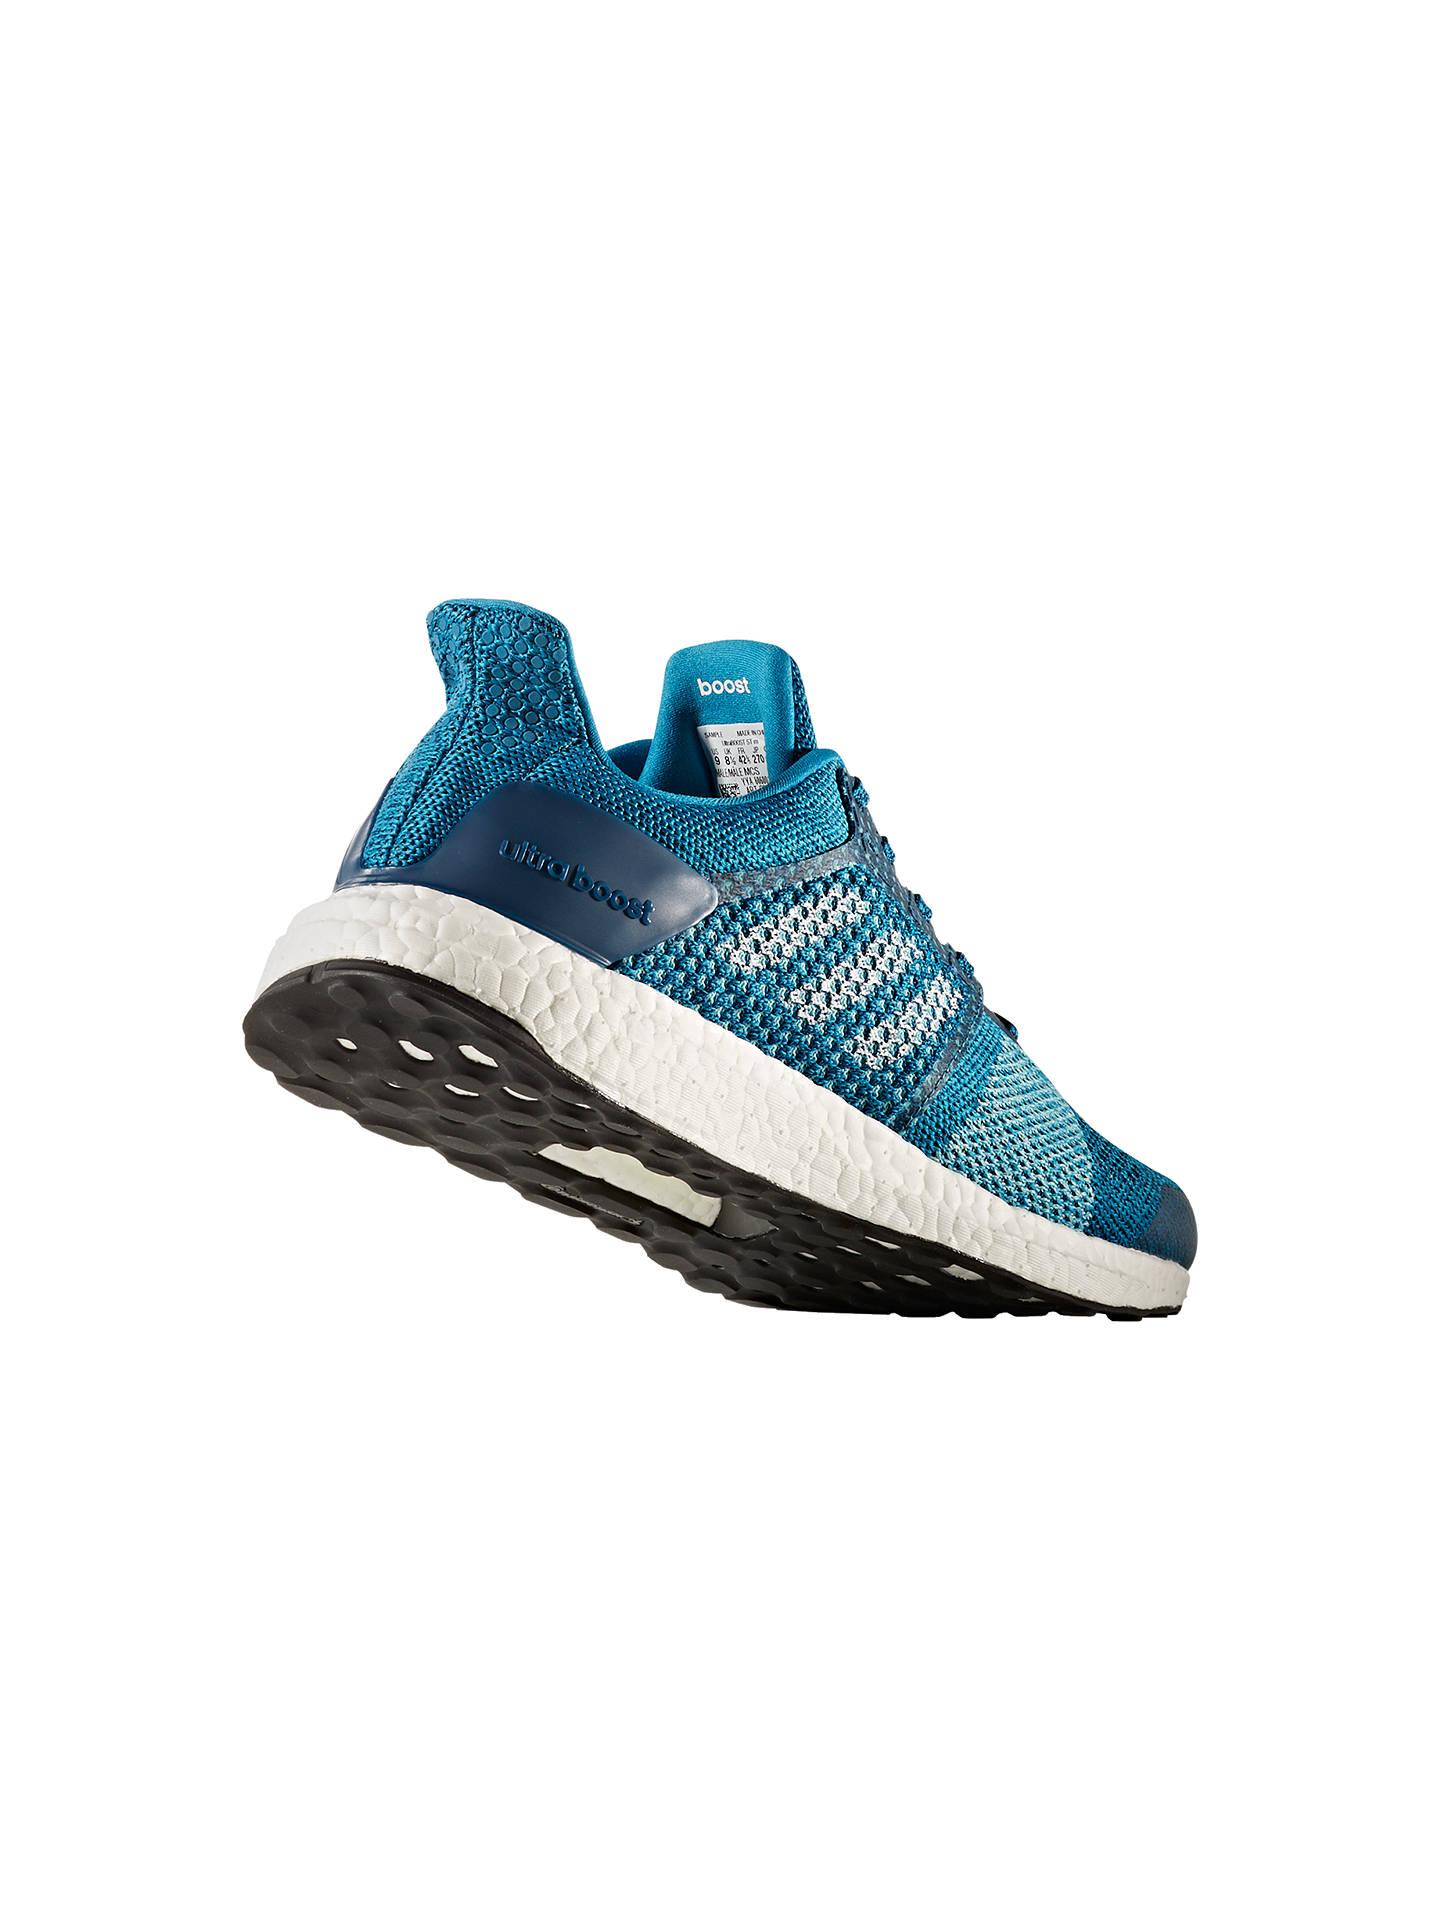 e877cda4c95 ... Buy adidas UltraBOOST ST Men s Running Shoes